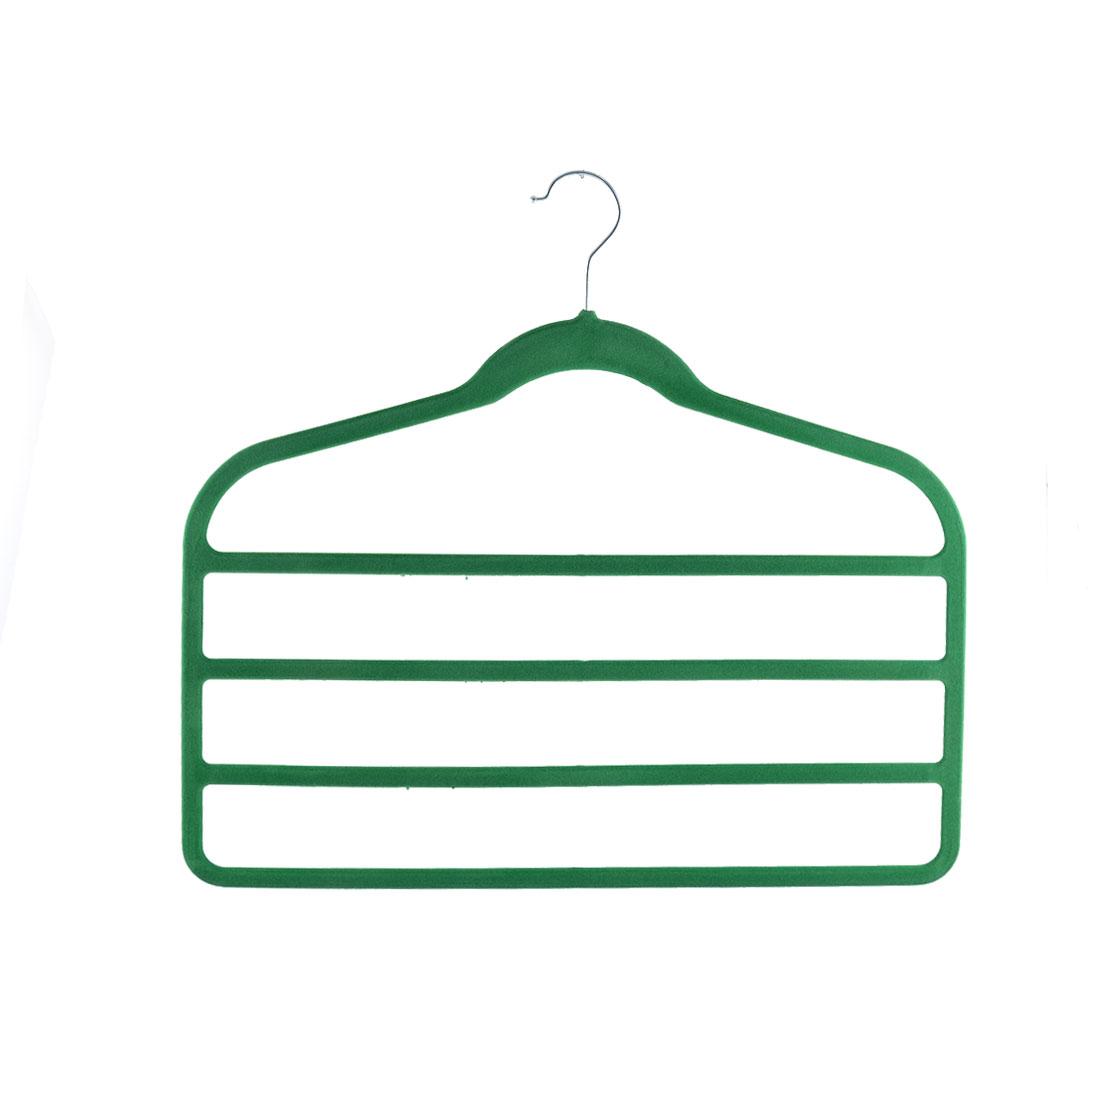 Home Velvet Anti-slip Shawl Coat Towel Clothes Trousers Holder Rack Organizer Green